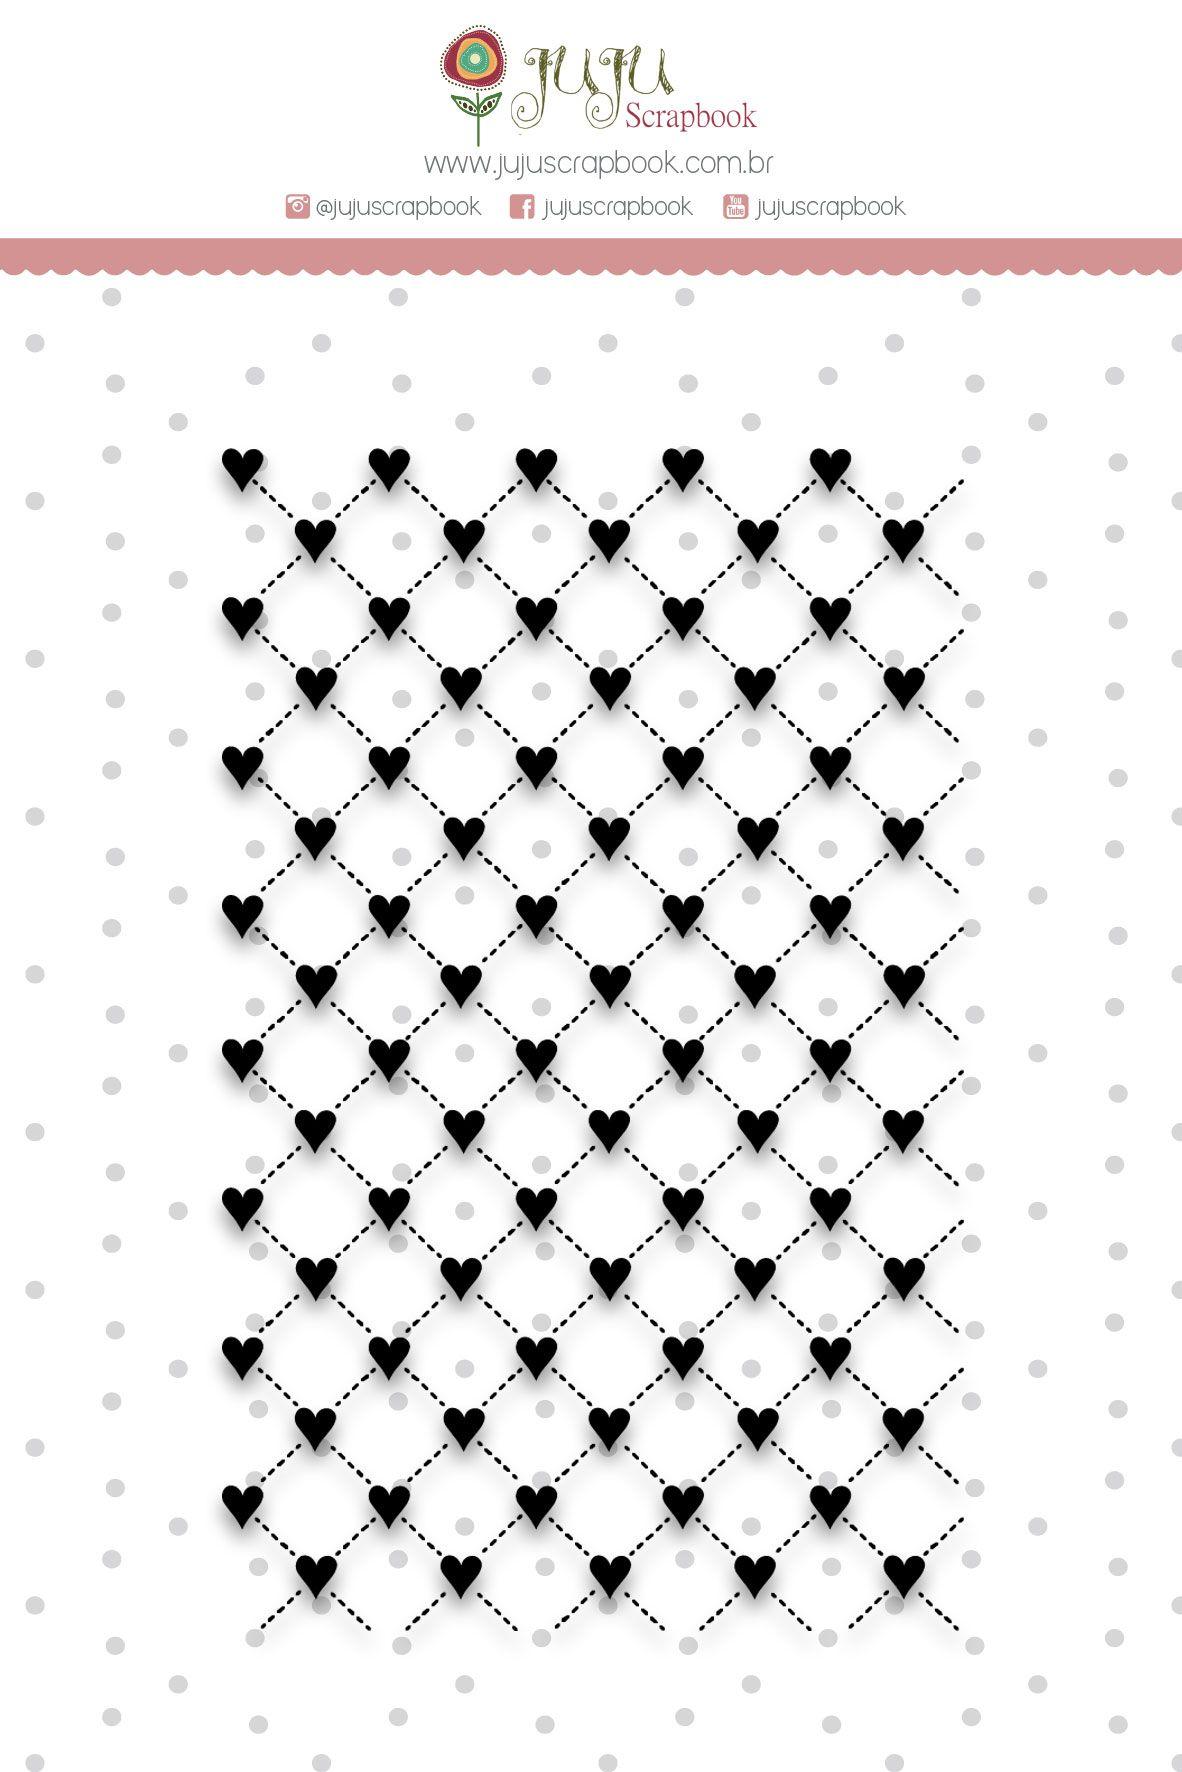 Carimbo XG Corações - Coleção Shabby Dreams - JuJu Scrapbook  - JuJu Scrapbook